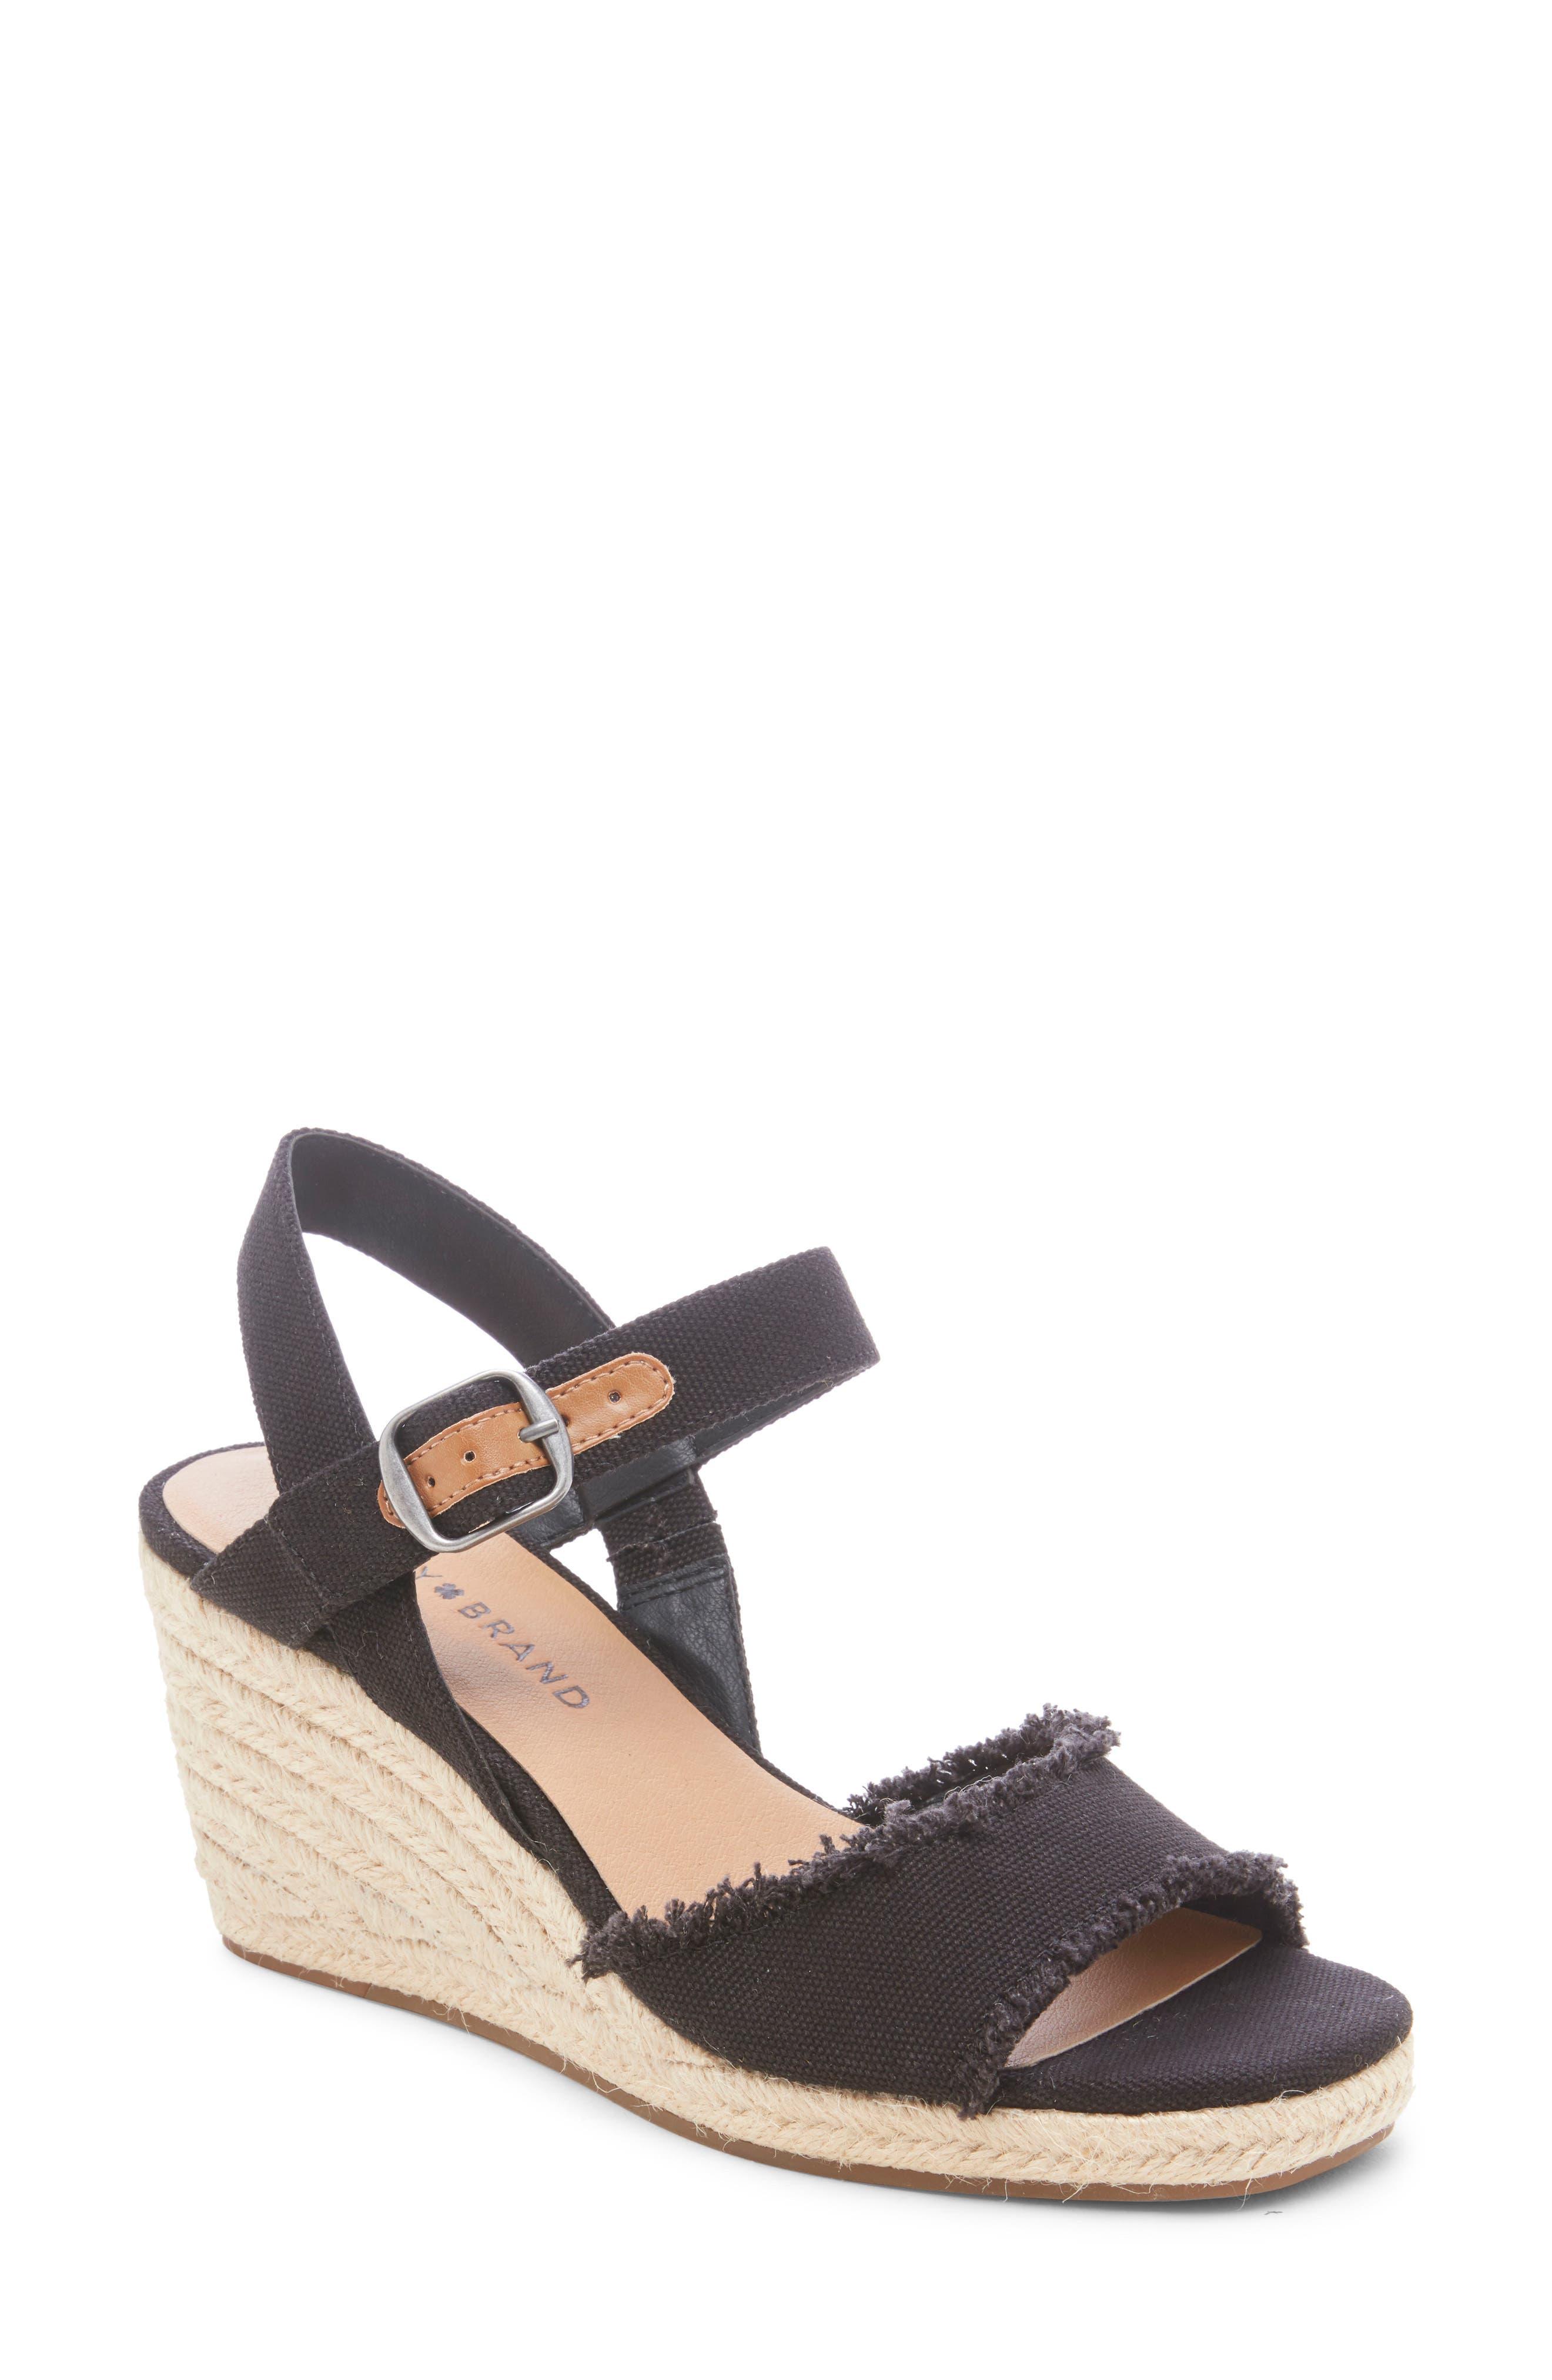 LUCKY BRAND,                             Mindra Espadrille Wedge Sandal,                             Main thumbnail 1, color,                             BLACK FABRIC